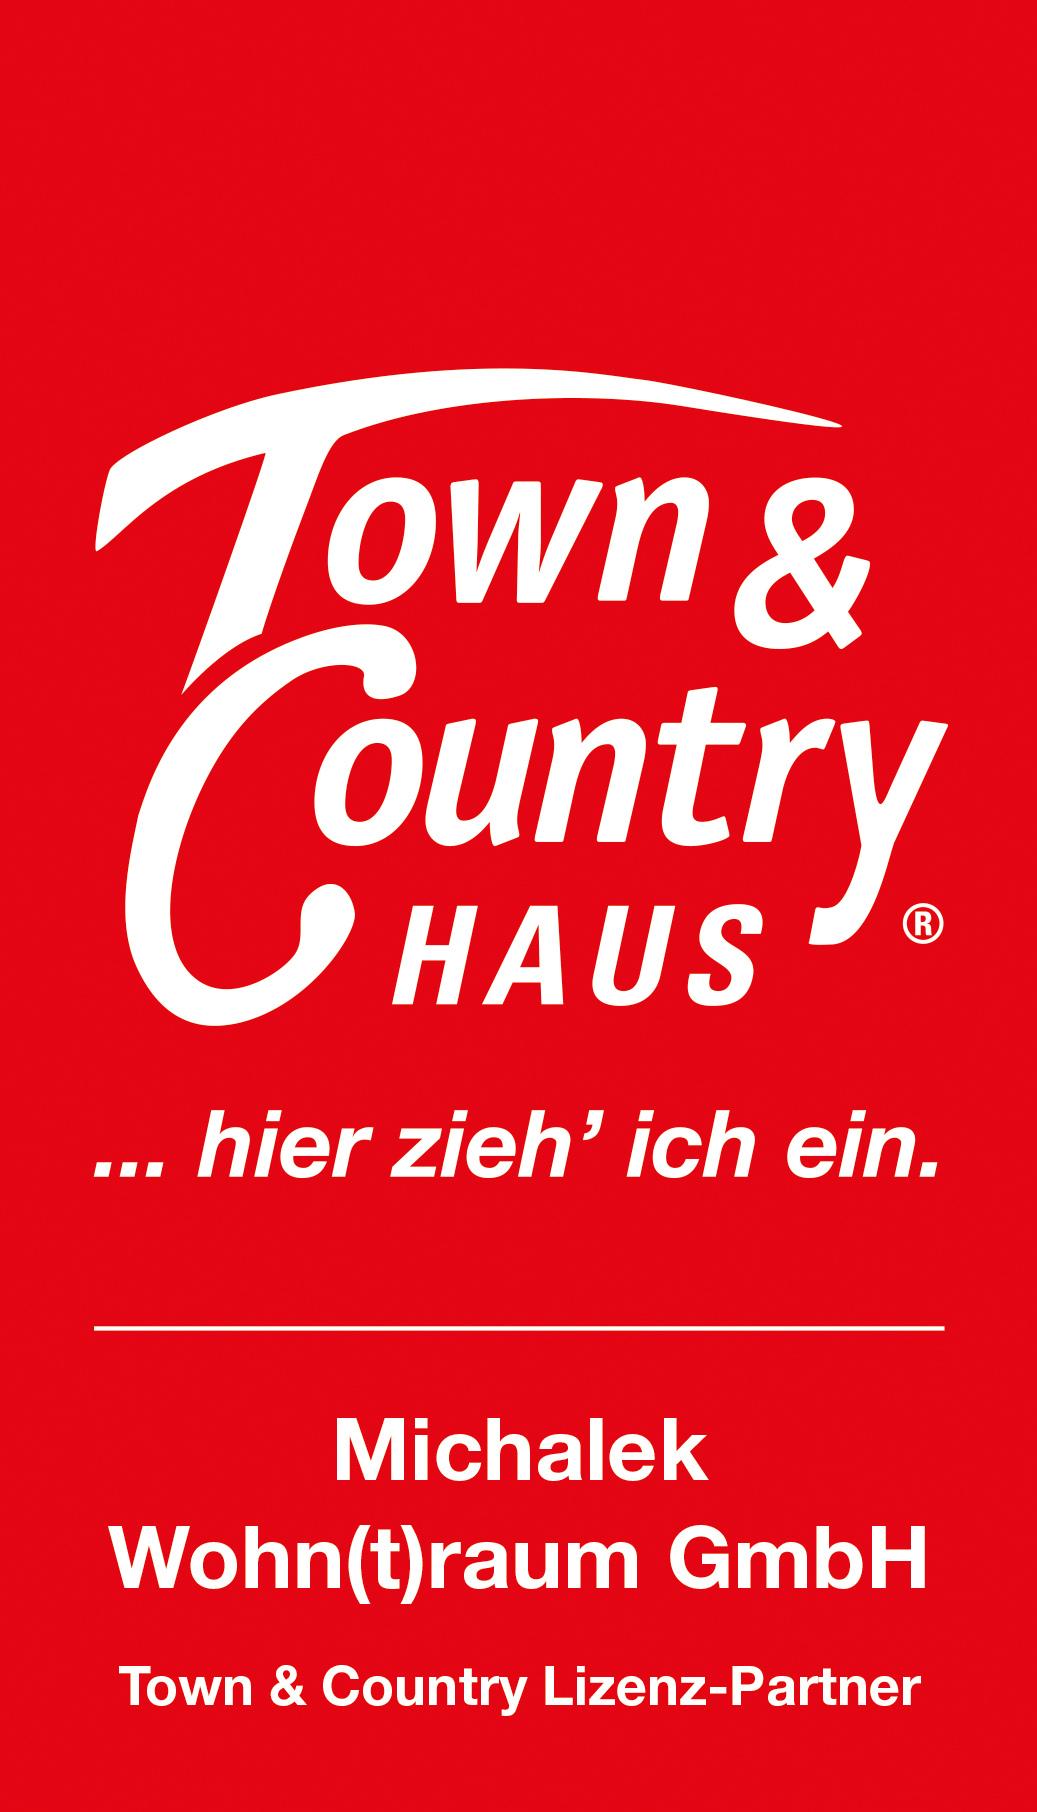 Profil von Town & Country Haus aus Heilbronn